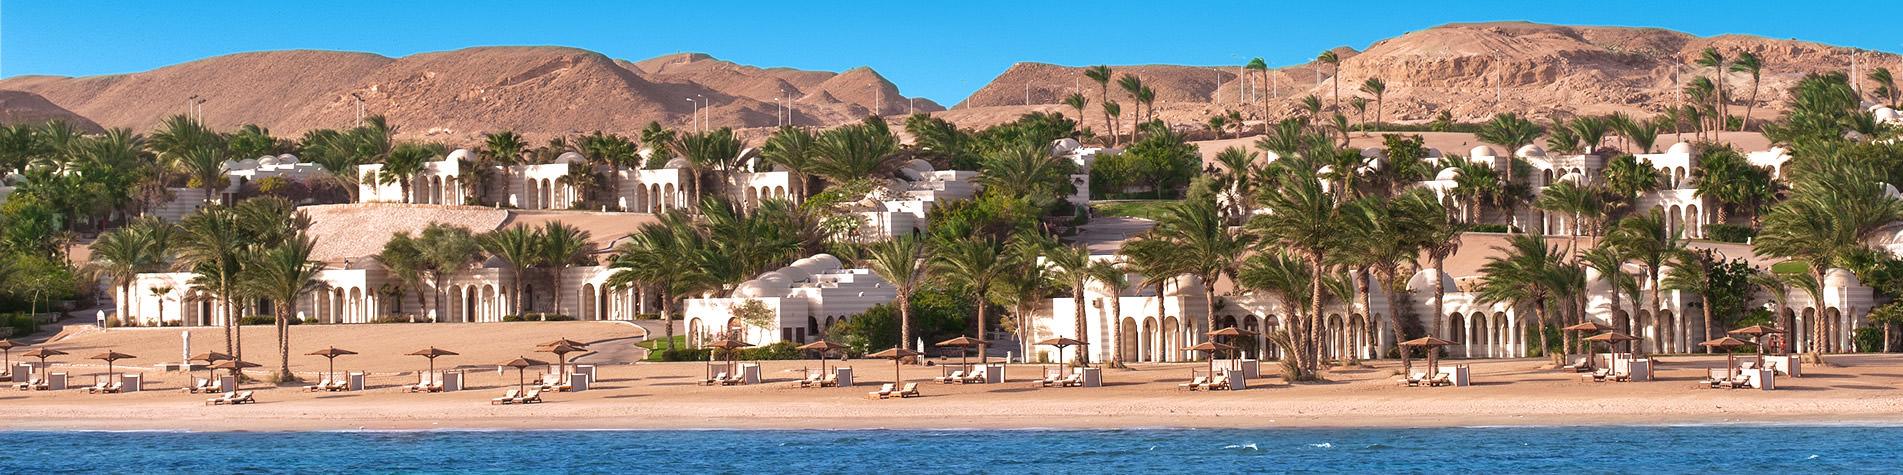 Sahl Hasheesh Bay Holidays with Cyplon Holidays